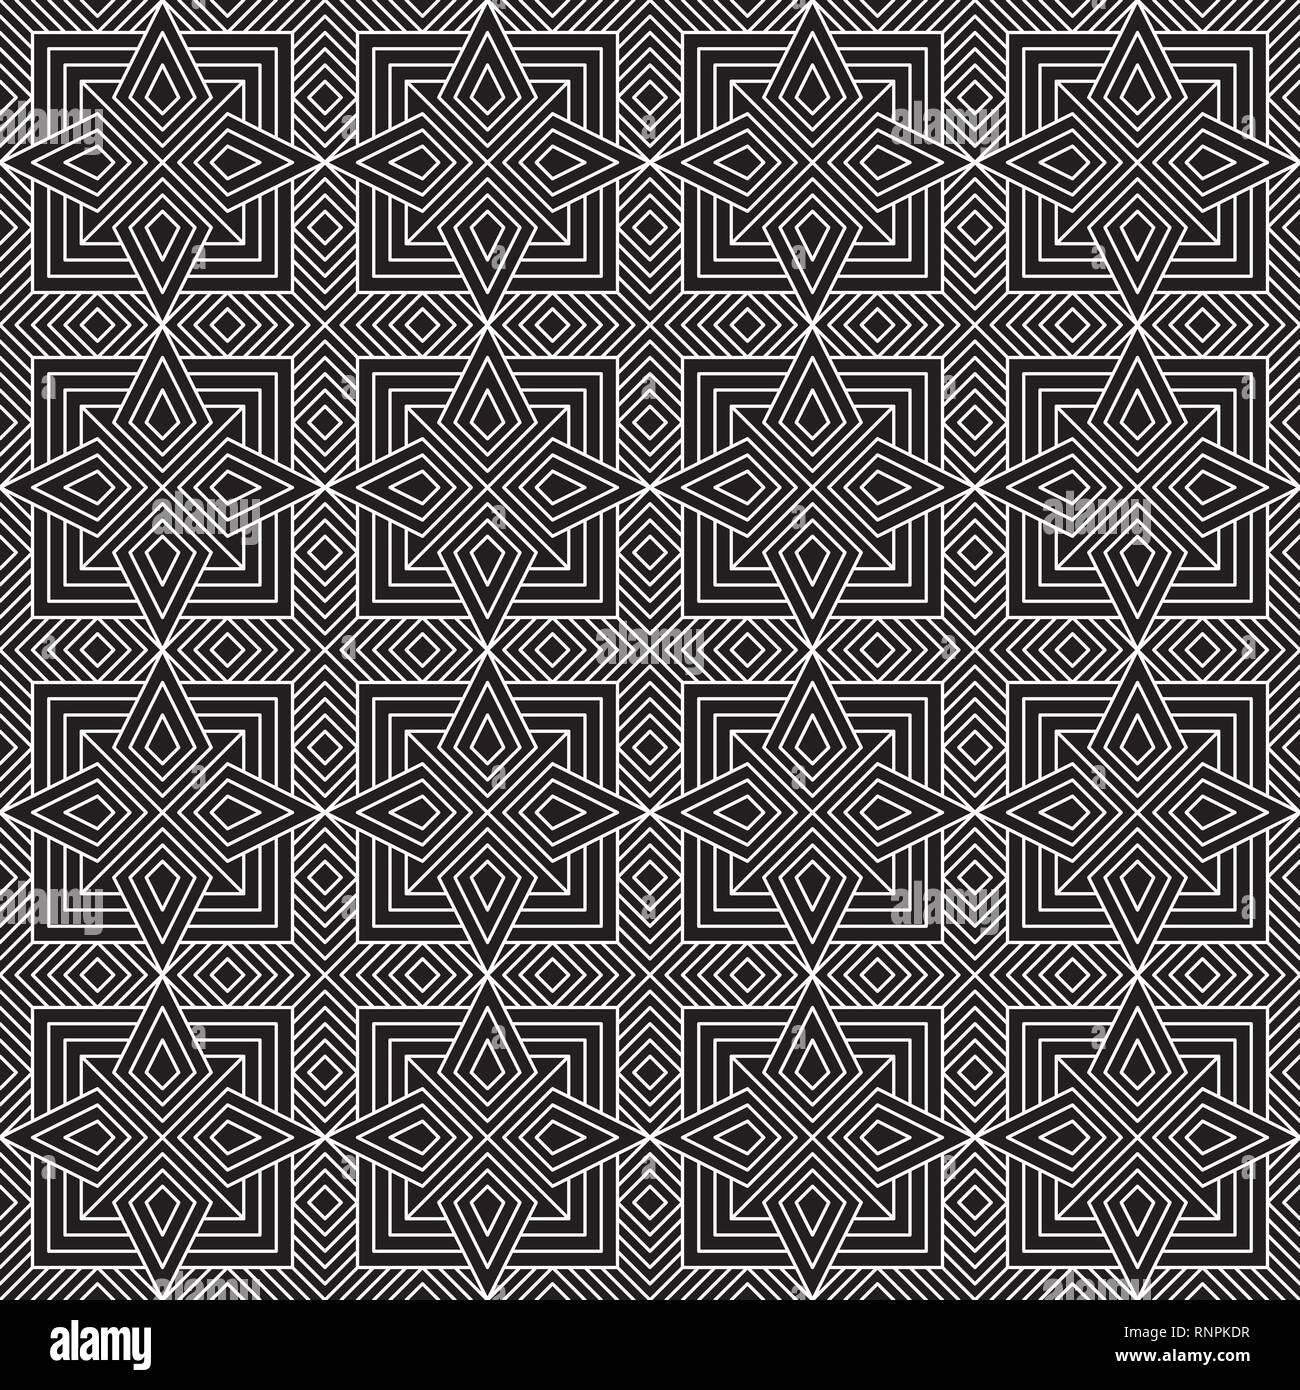 Seamless Geometric Pattern Black and White Vector Illustration